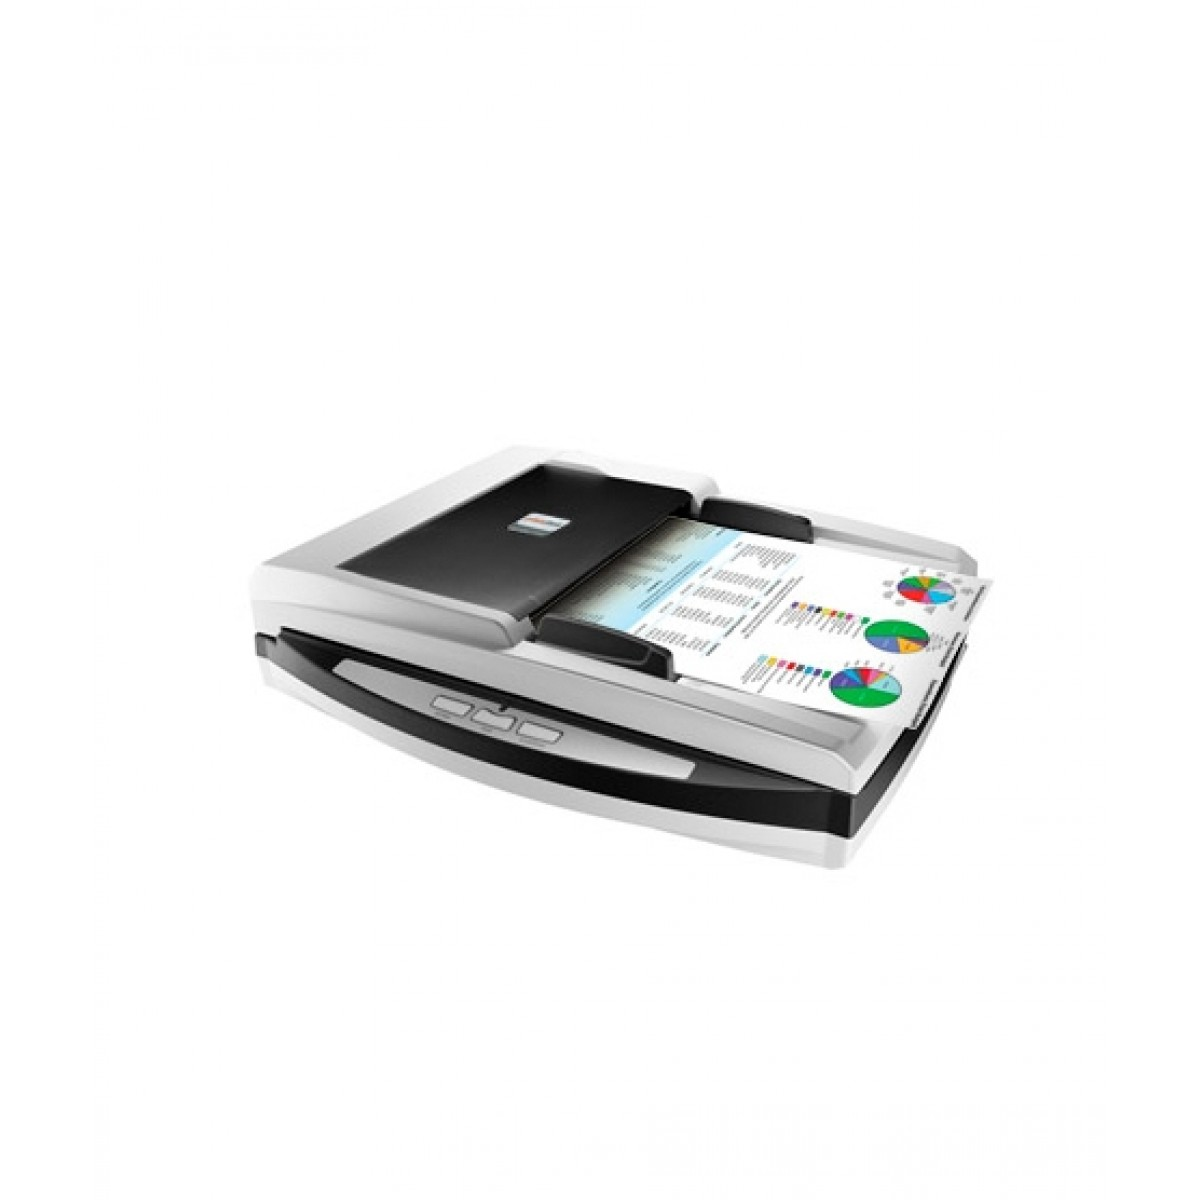 Plustek A4 SmartOffice PL3060 Desktop Scanner